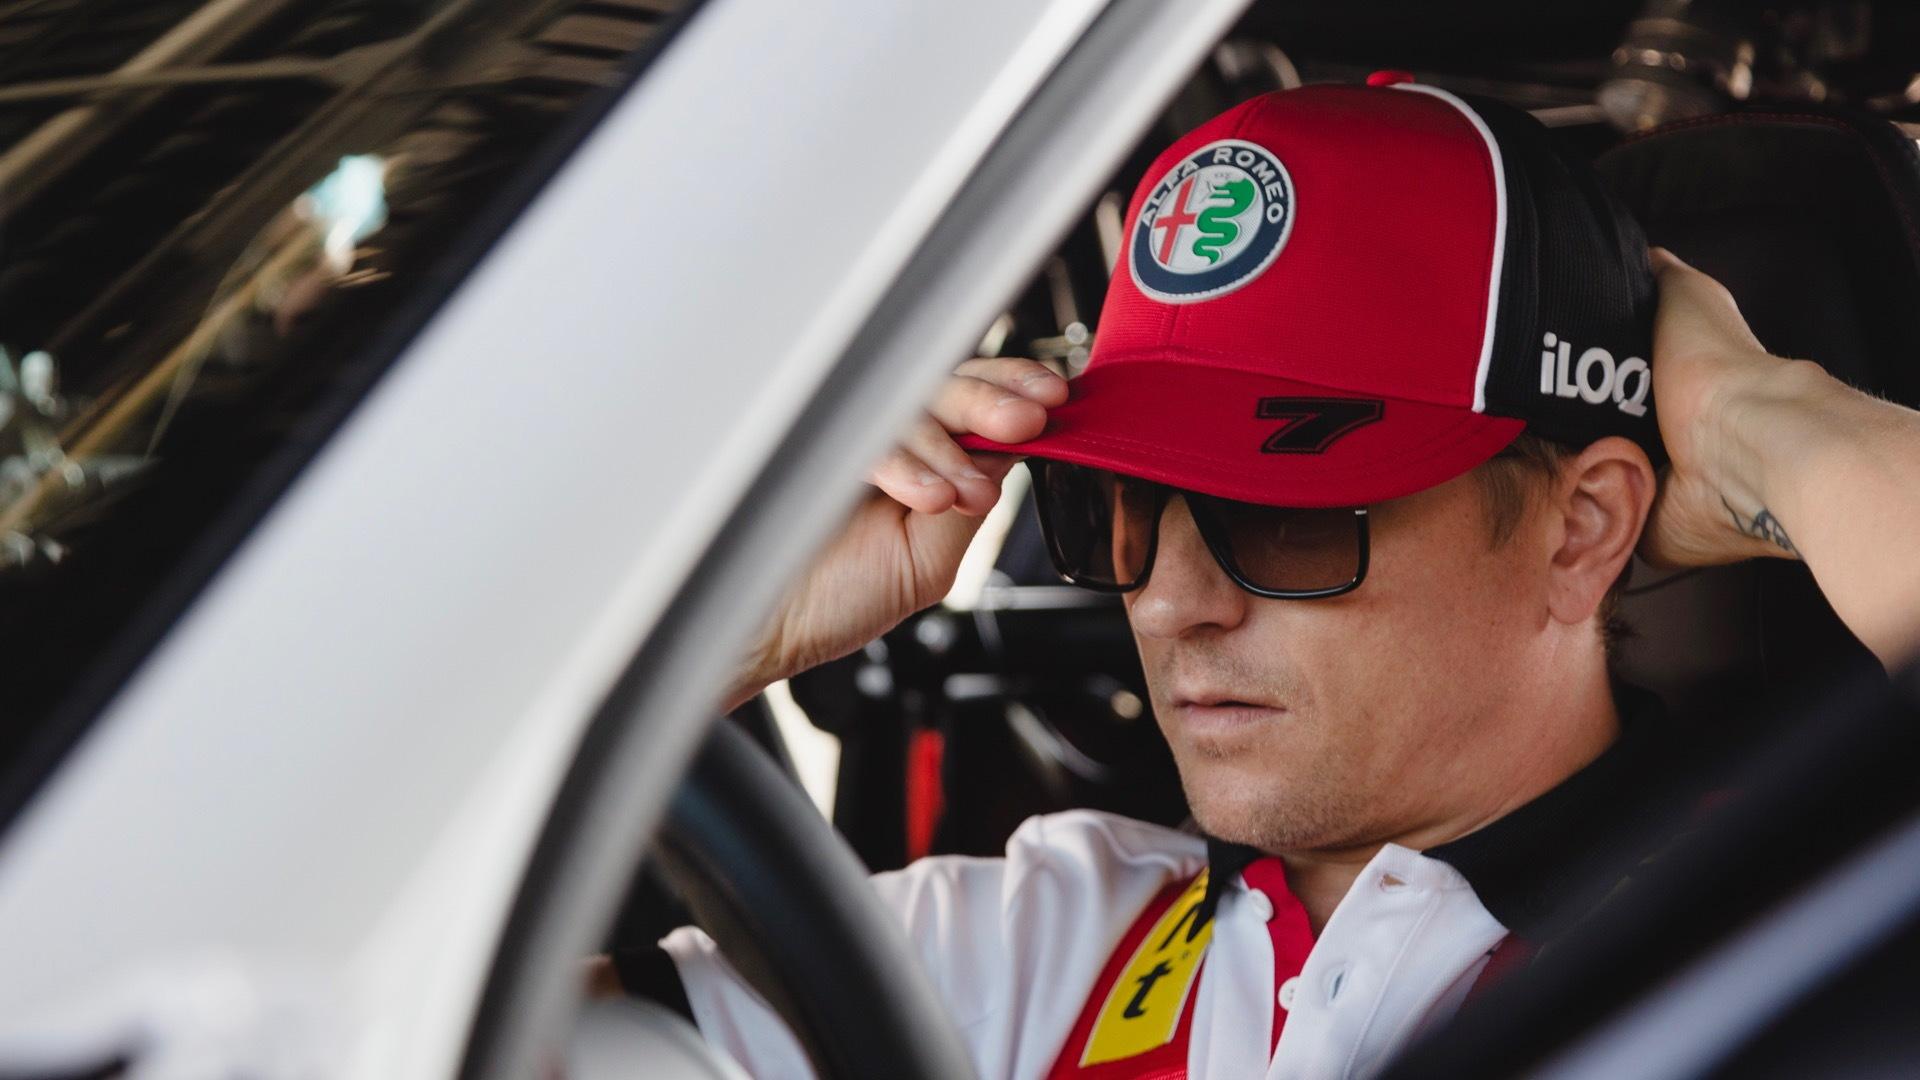 Kimi Raikkonen drives a 2020 Alfa Romeo Giulia GTA prototype